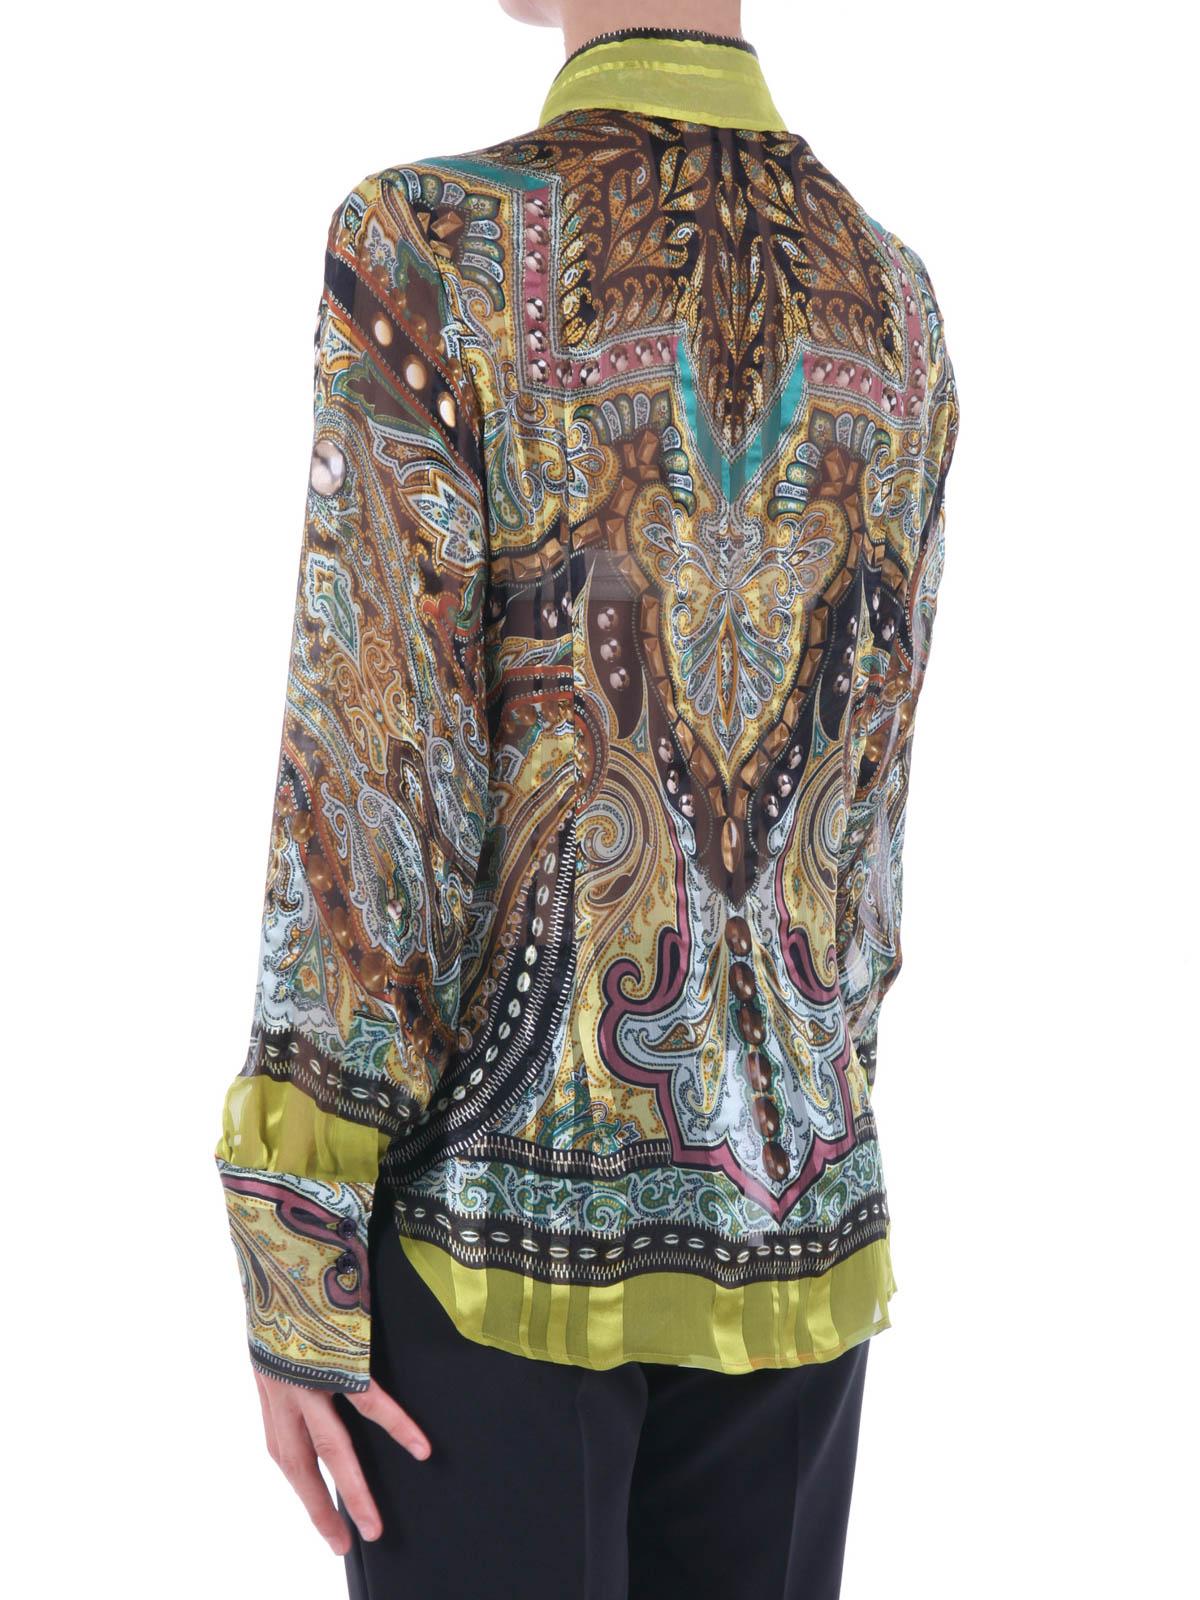 Camisa mujer Etro | Camisa Etro Mujer Fantasía | Camisa Etro